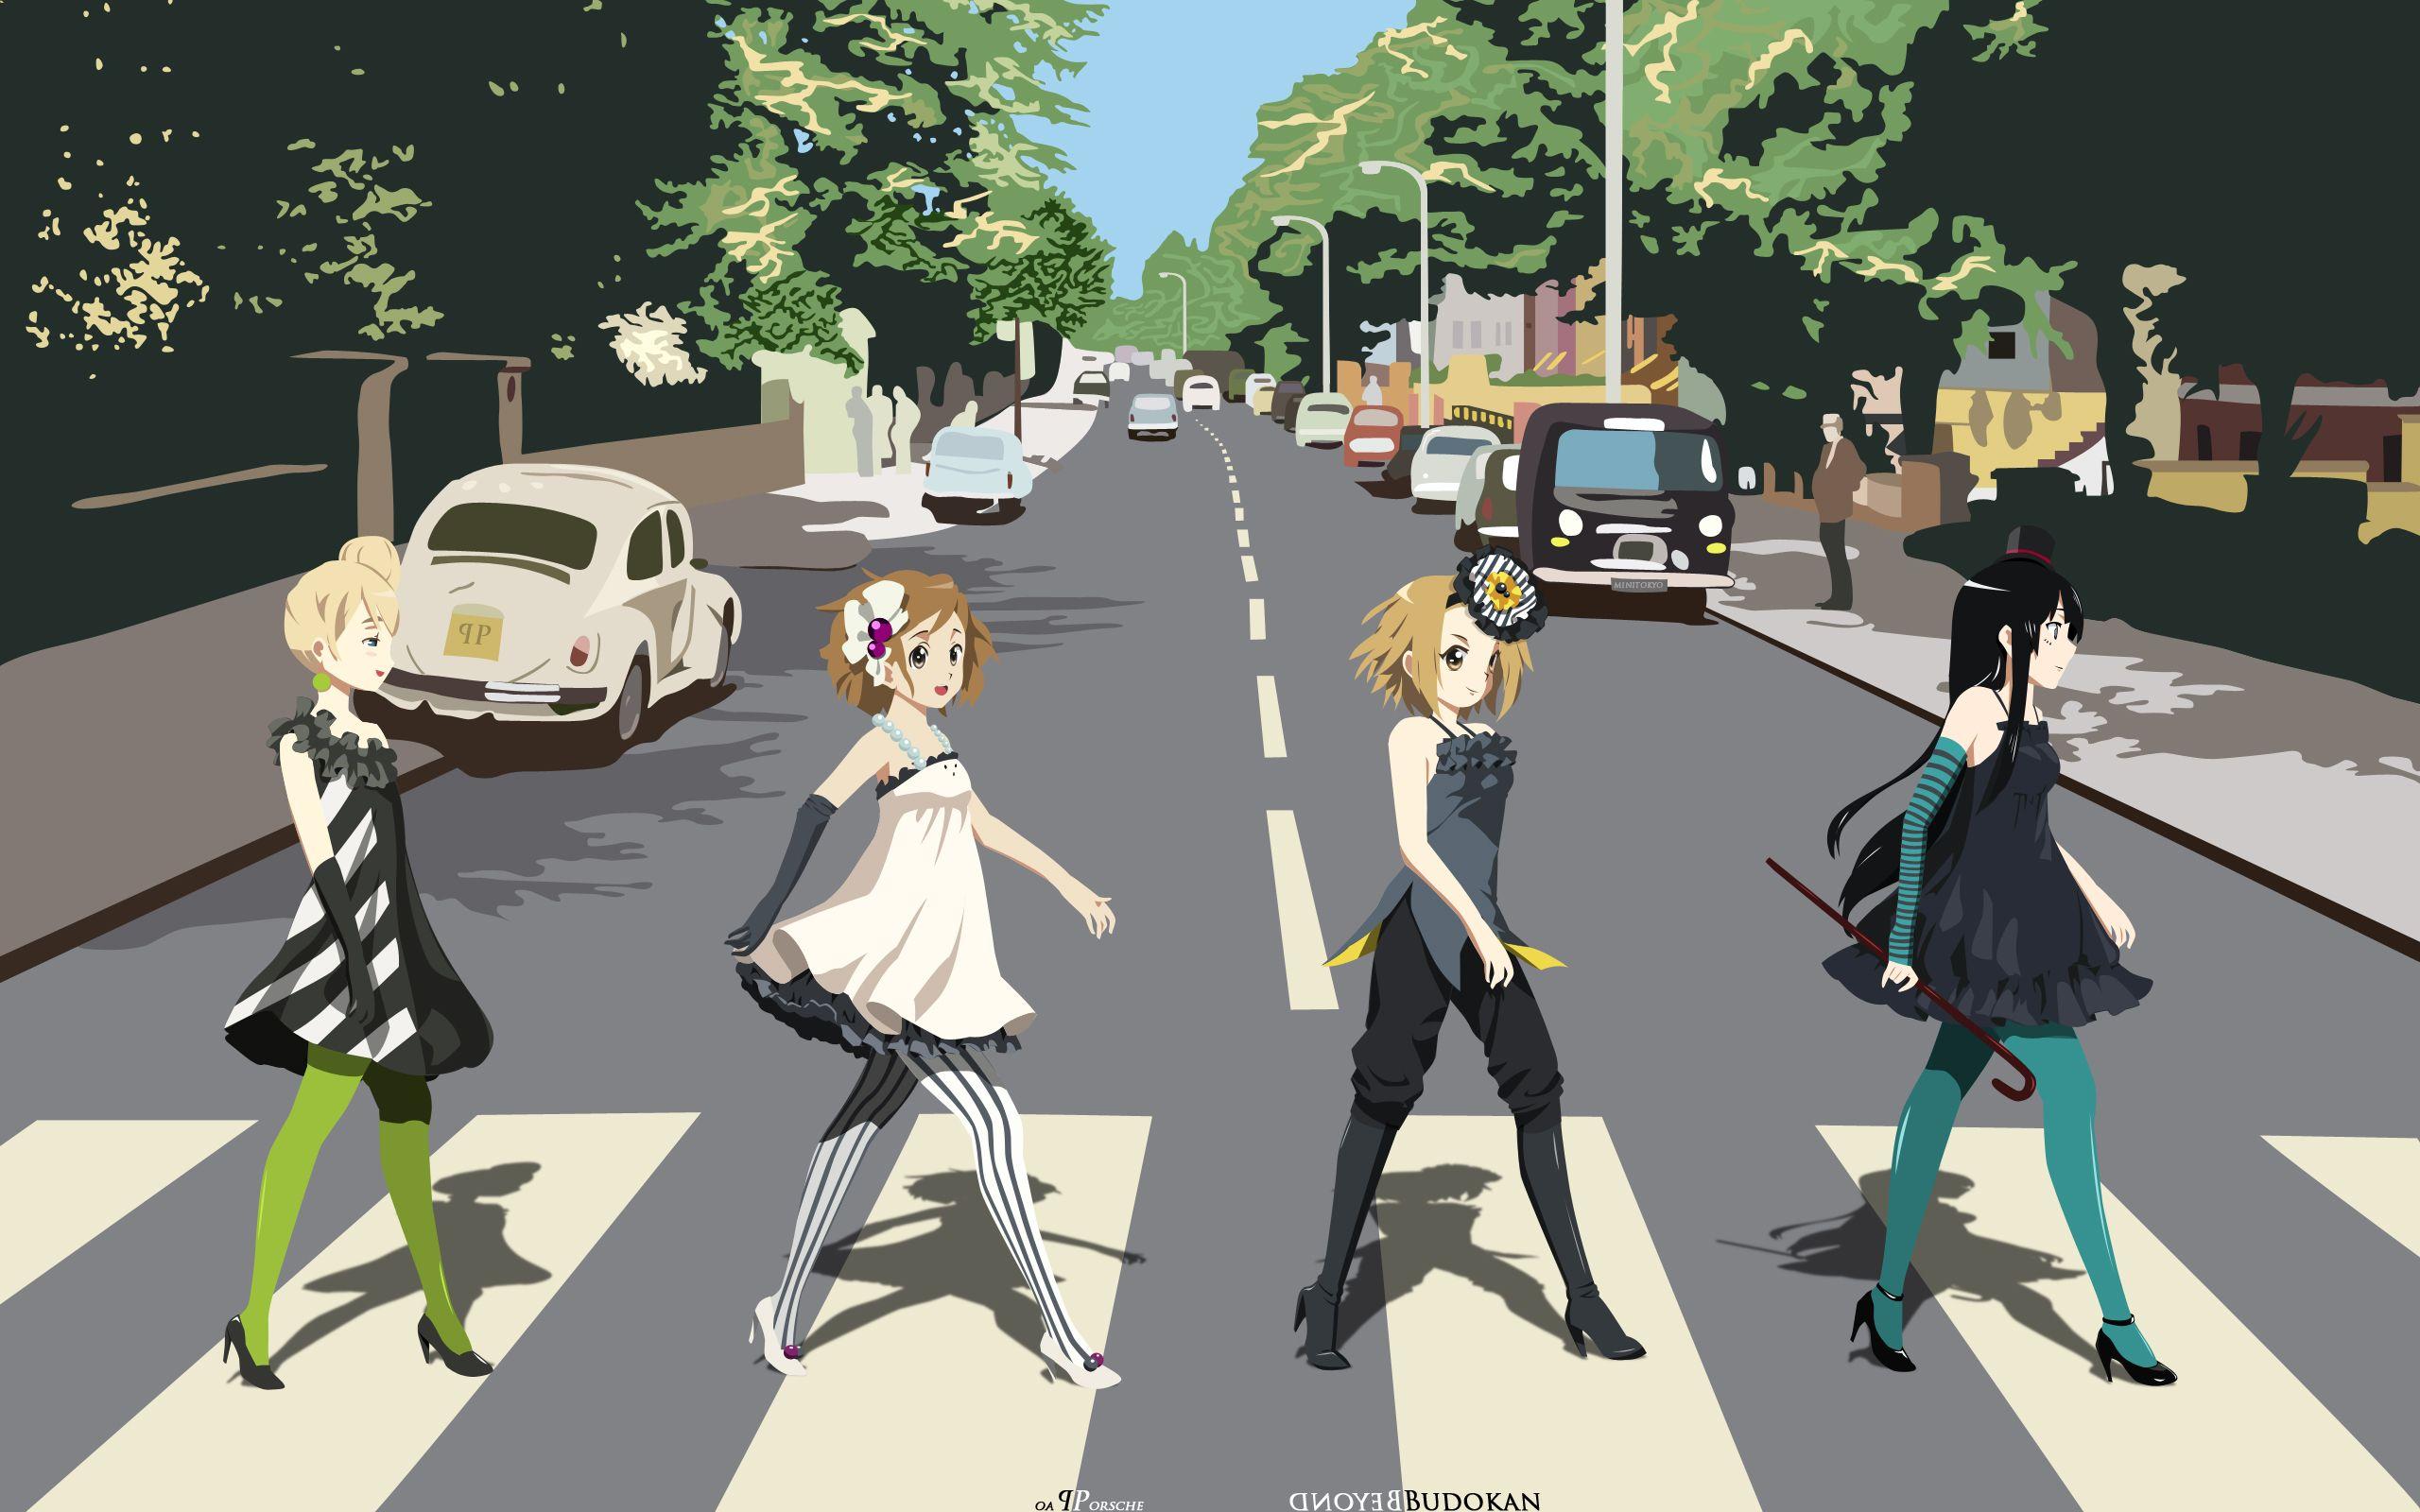 Abbey Road K ON Parody Hirasawa Yui Akiyama Mio Tainaka Ritsu Kotobuki Tsumugi Anime Striped Legwear